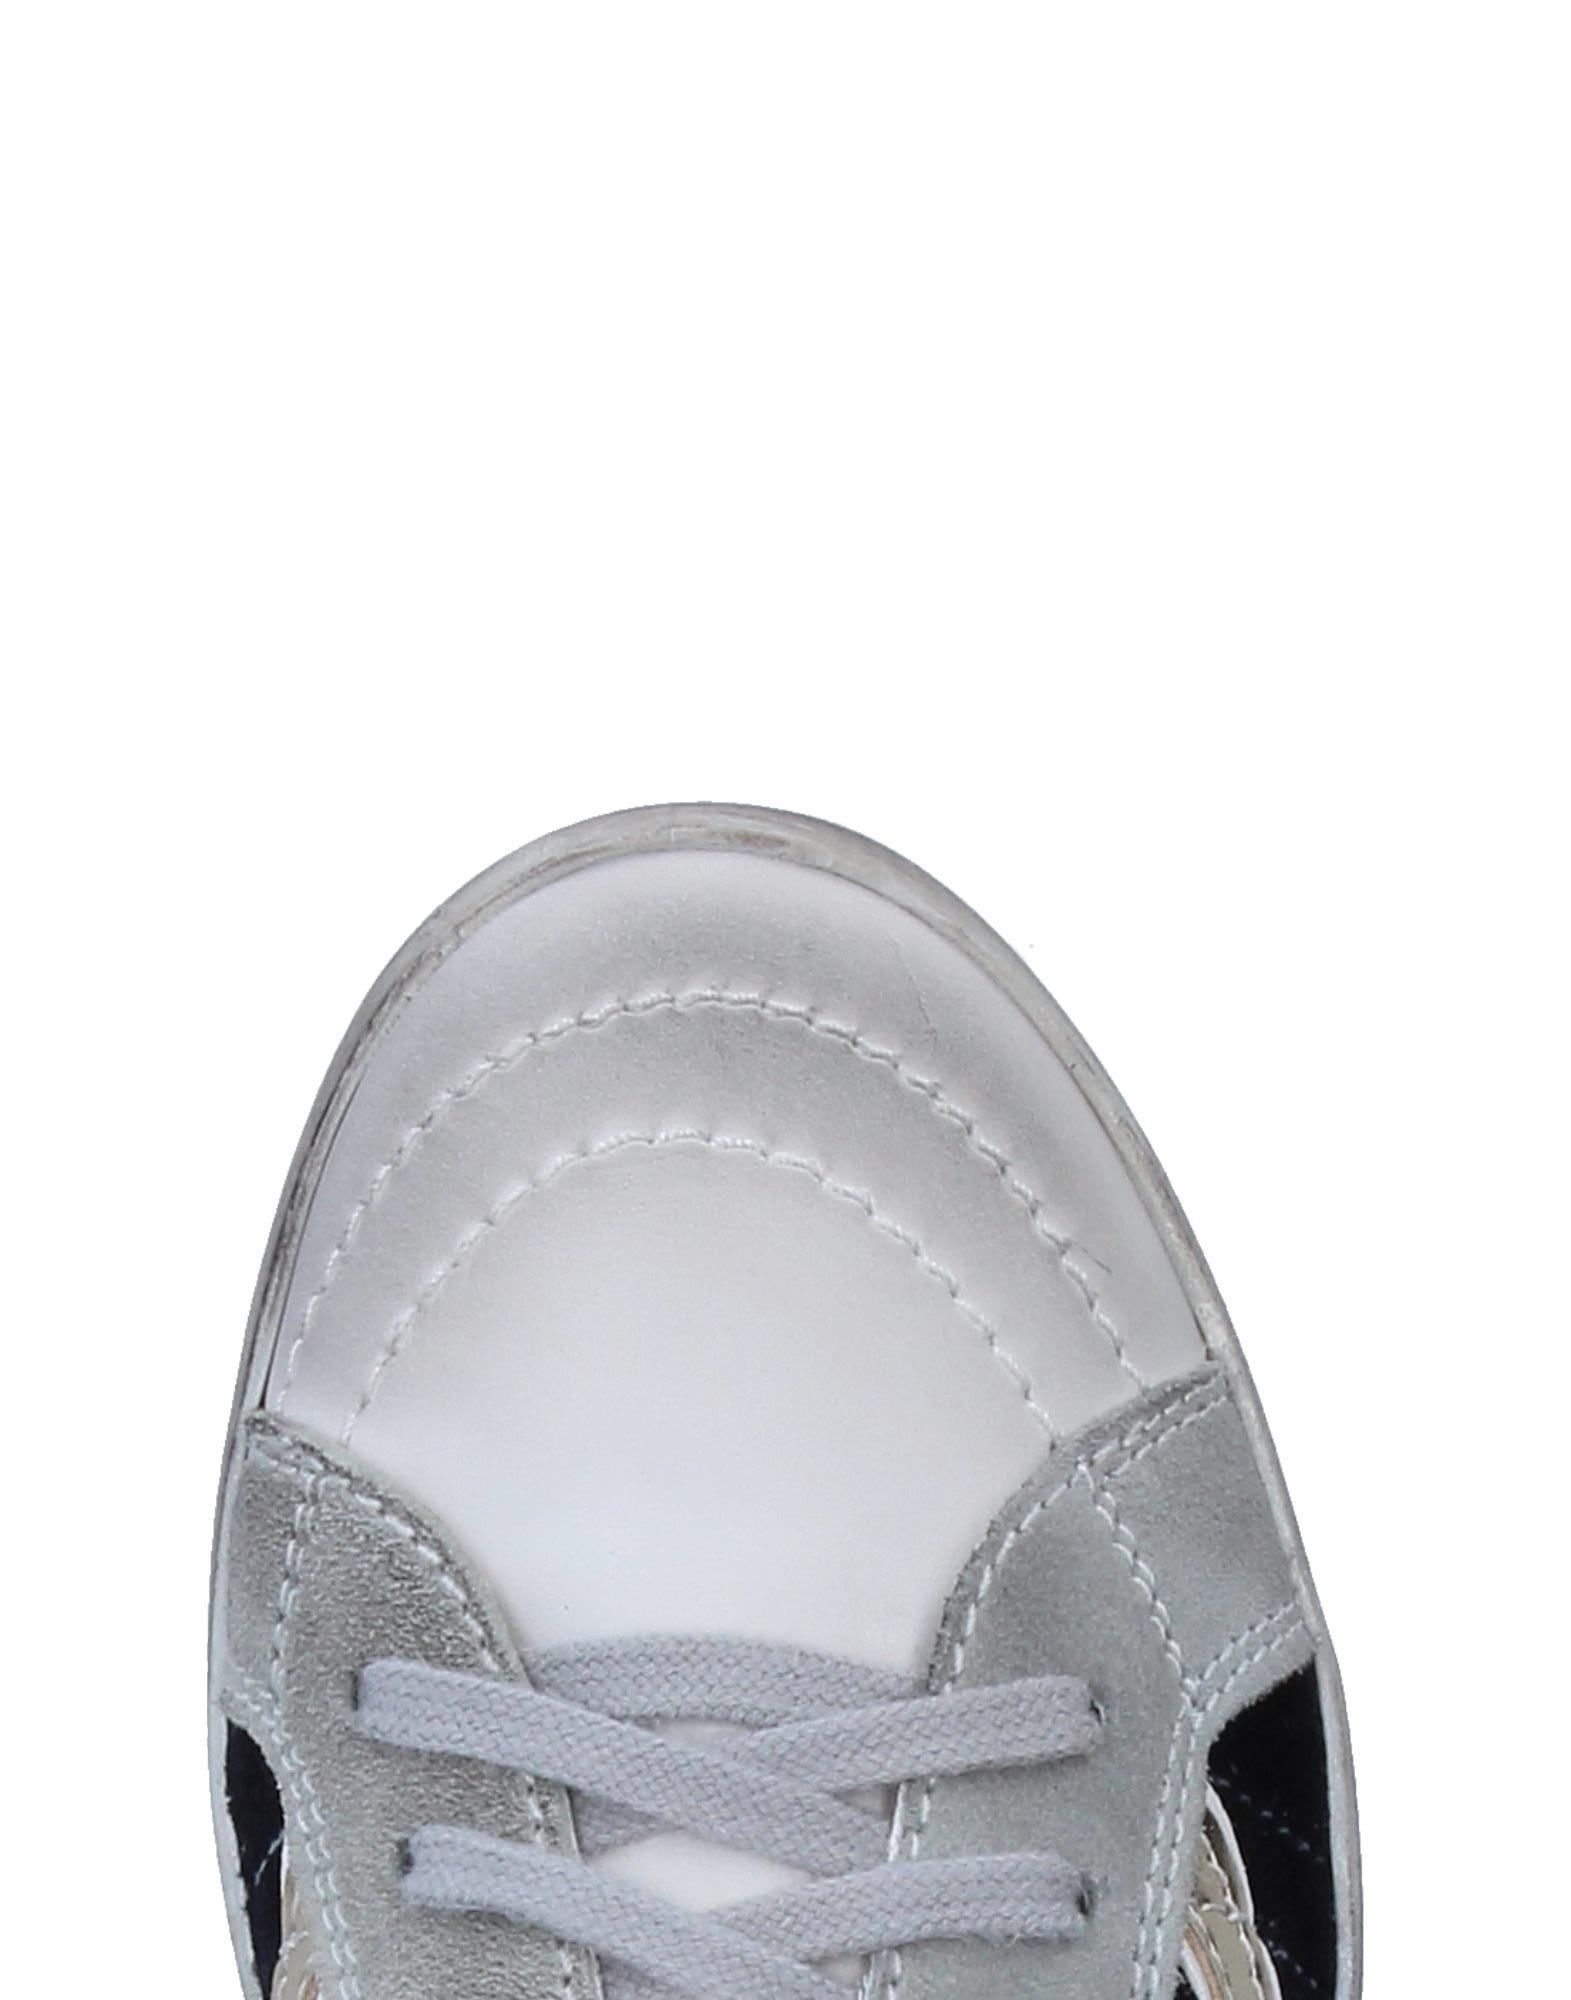 Primabase Sneakers Damen  11332890XK Gute Qualität beliebte Schuhe